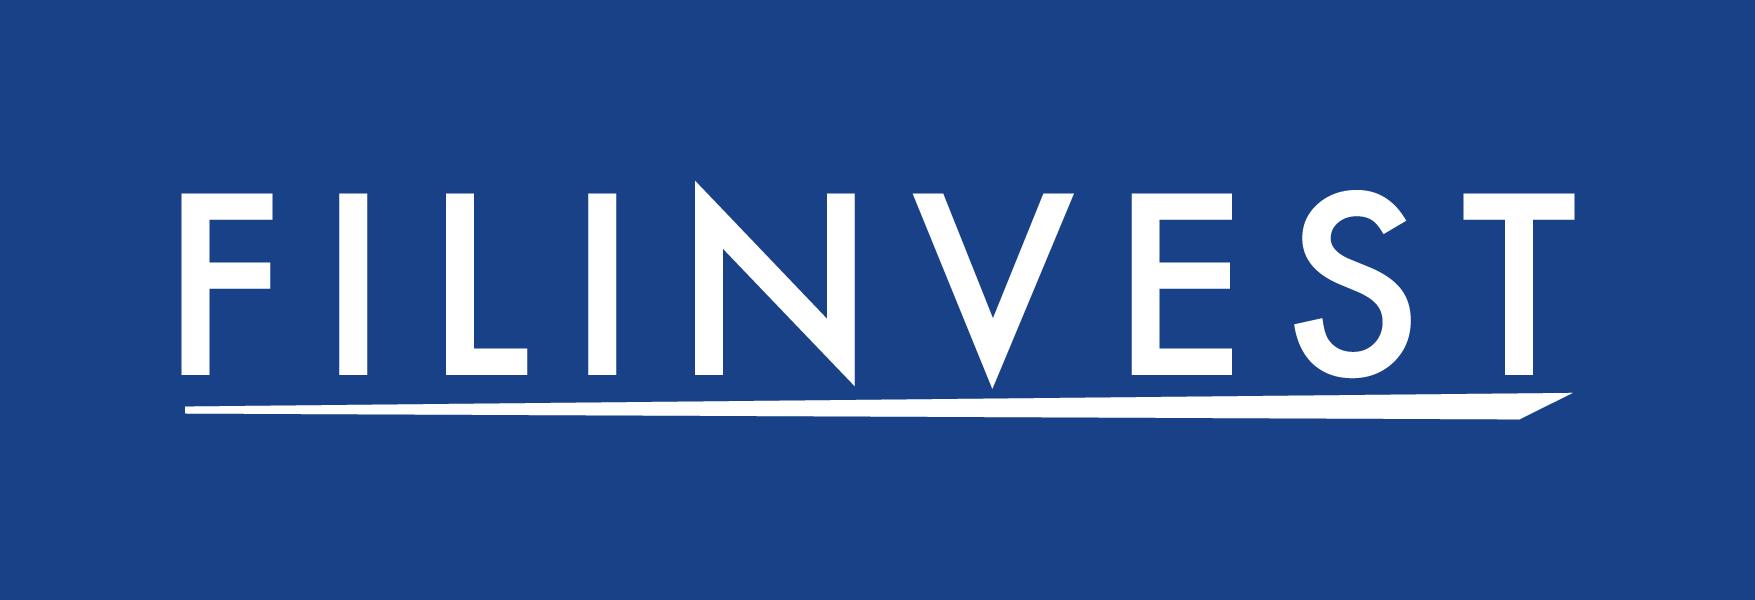 Filinvest Logo